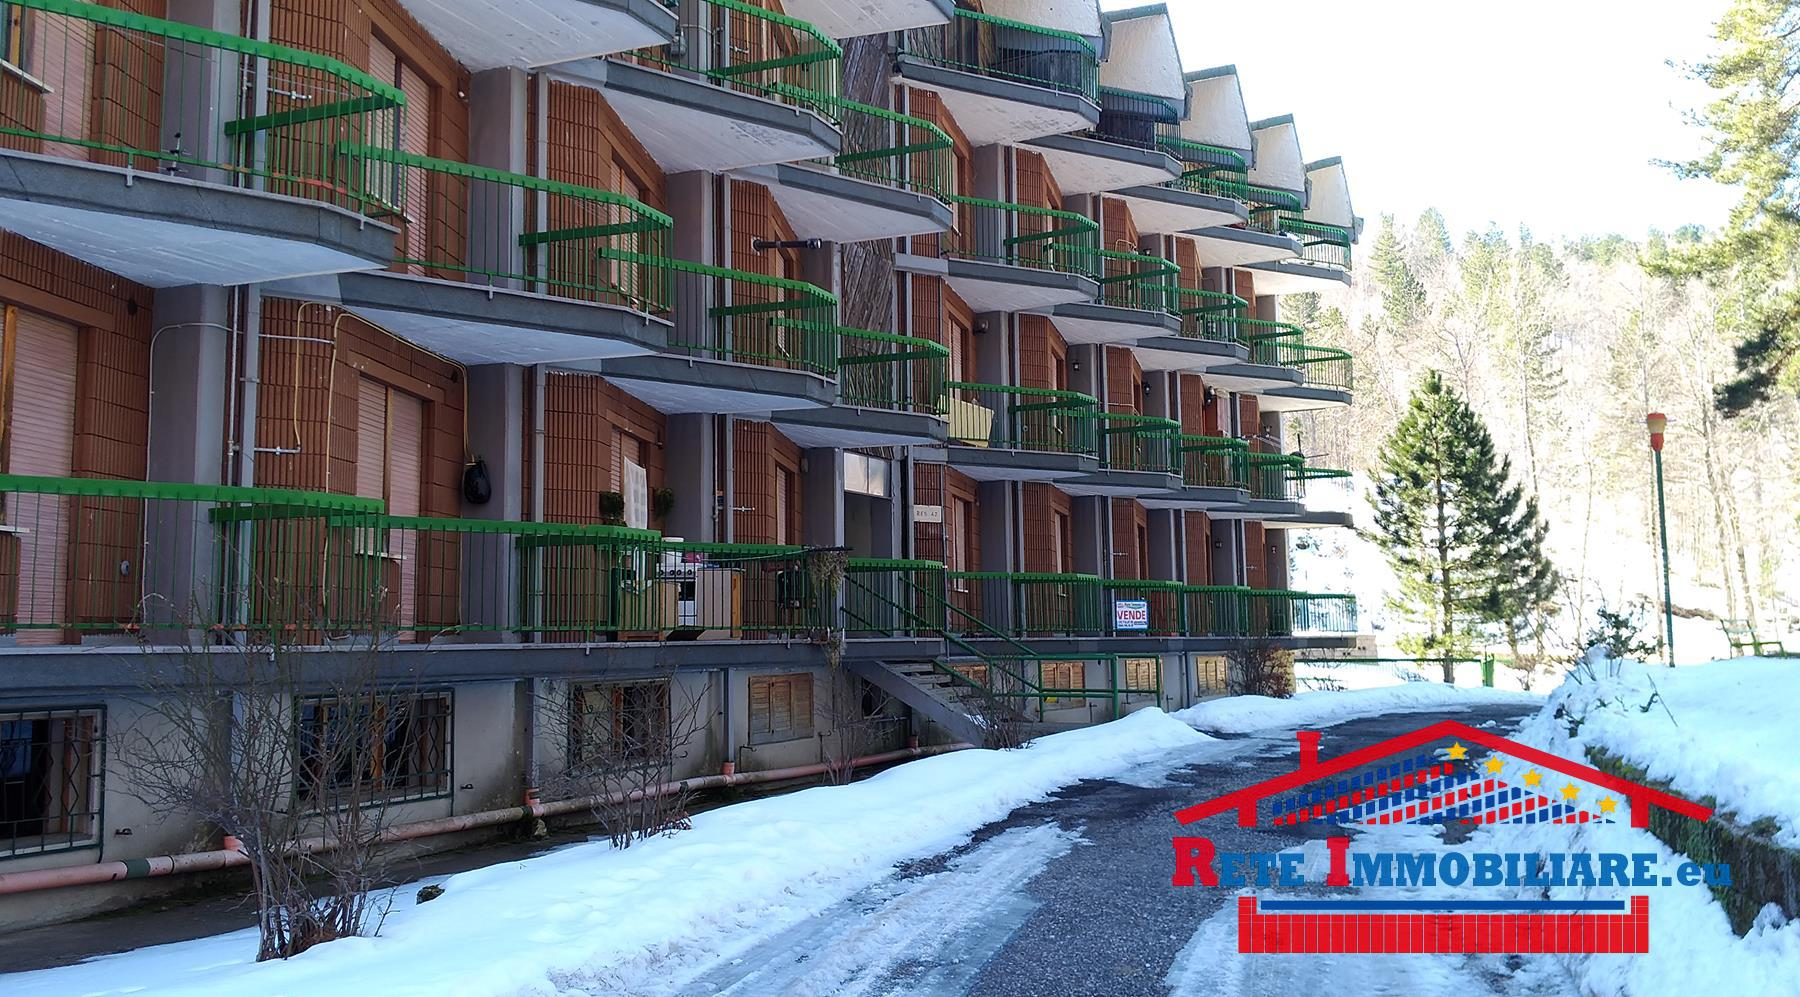 Vendesi appartamento a villaggio palumbo for Villaggio palumbo